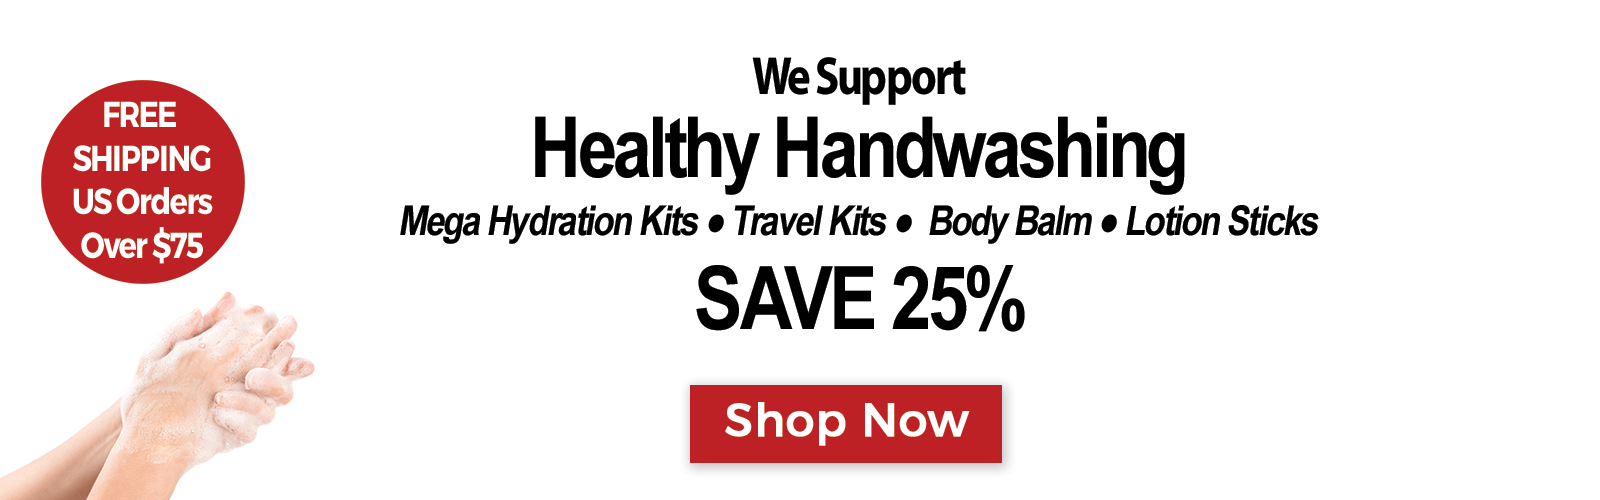 healthy-handwashing-banner2.png